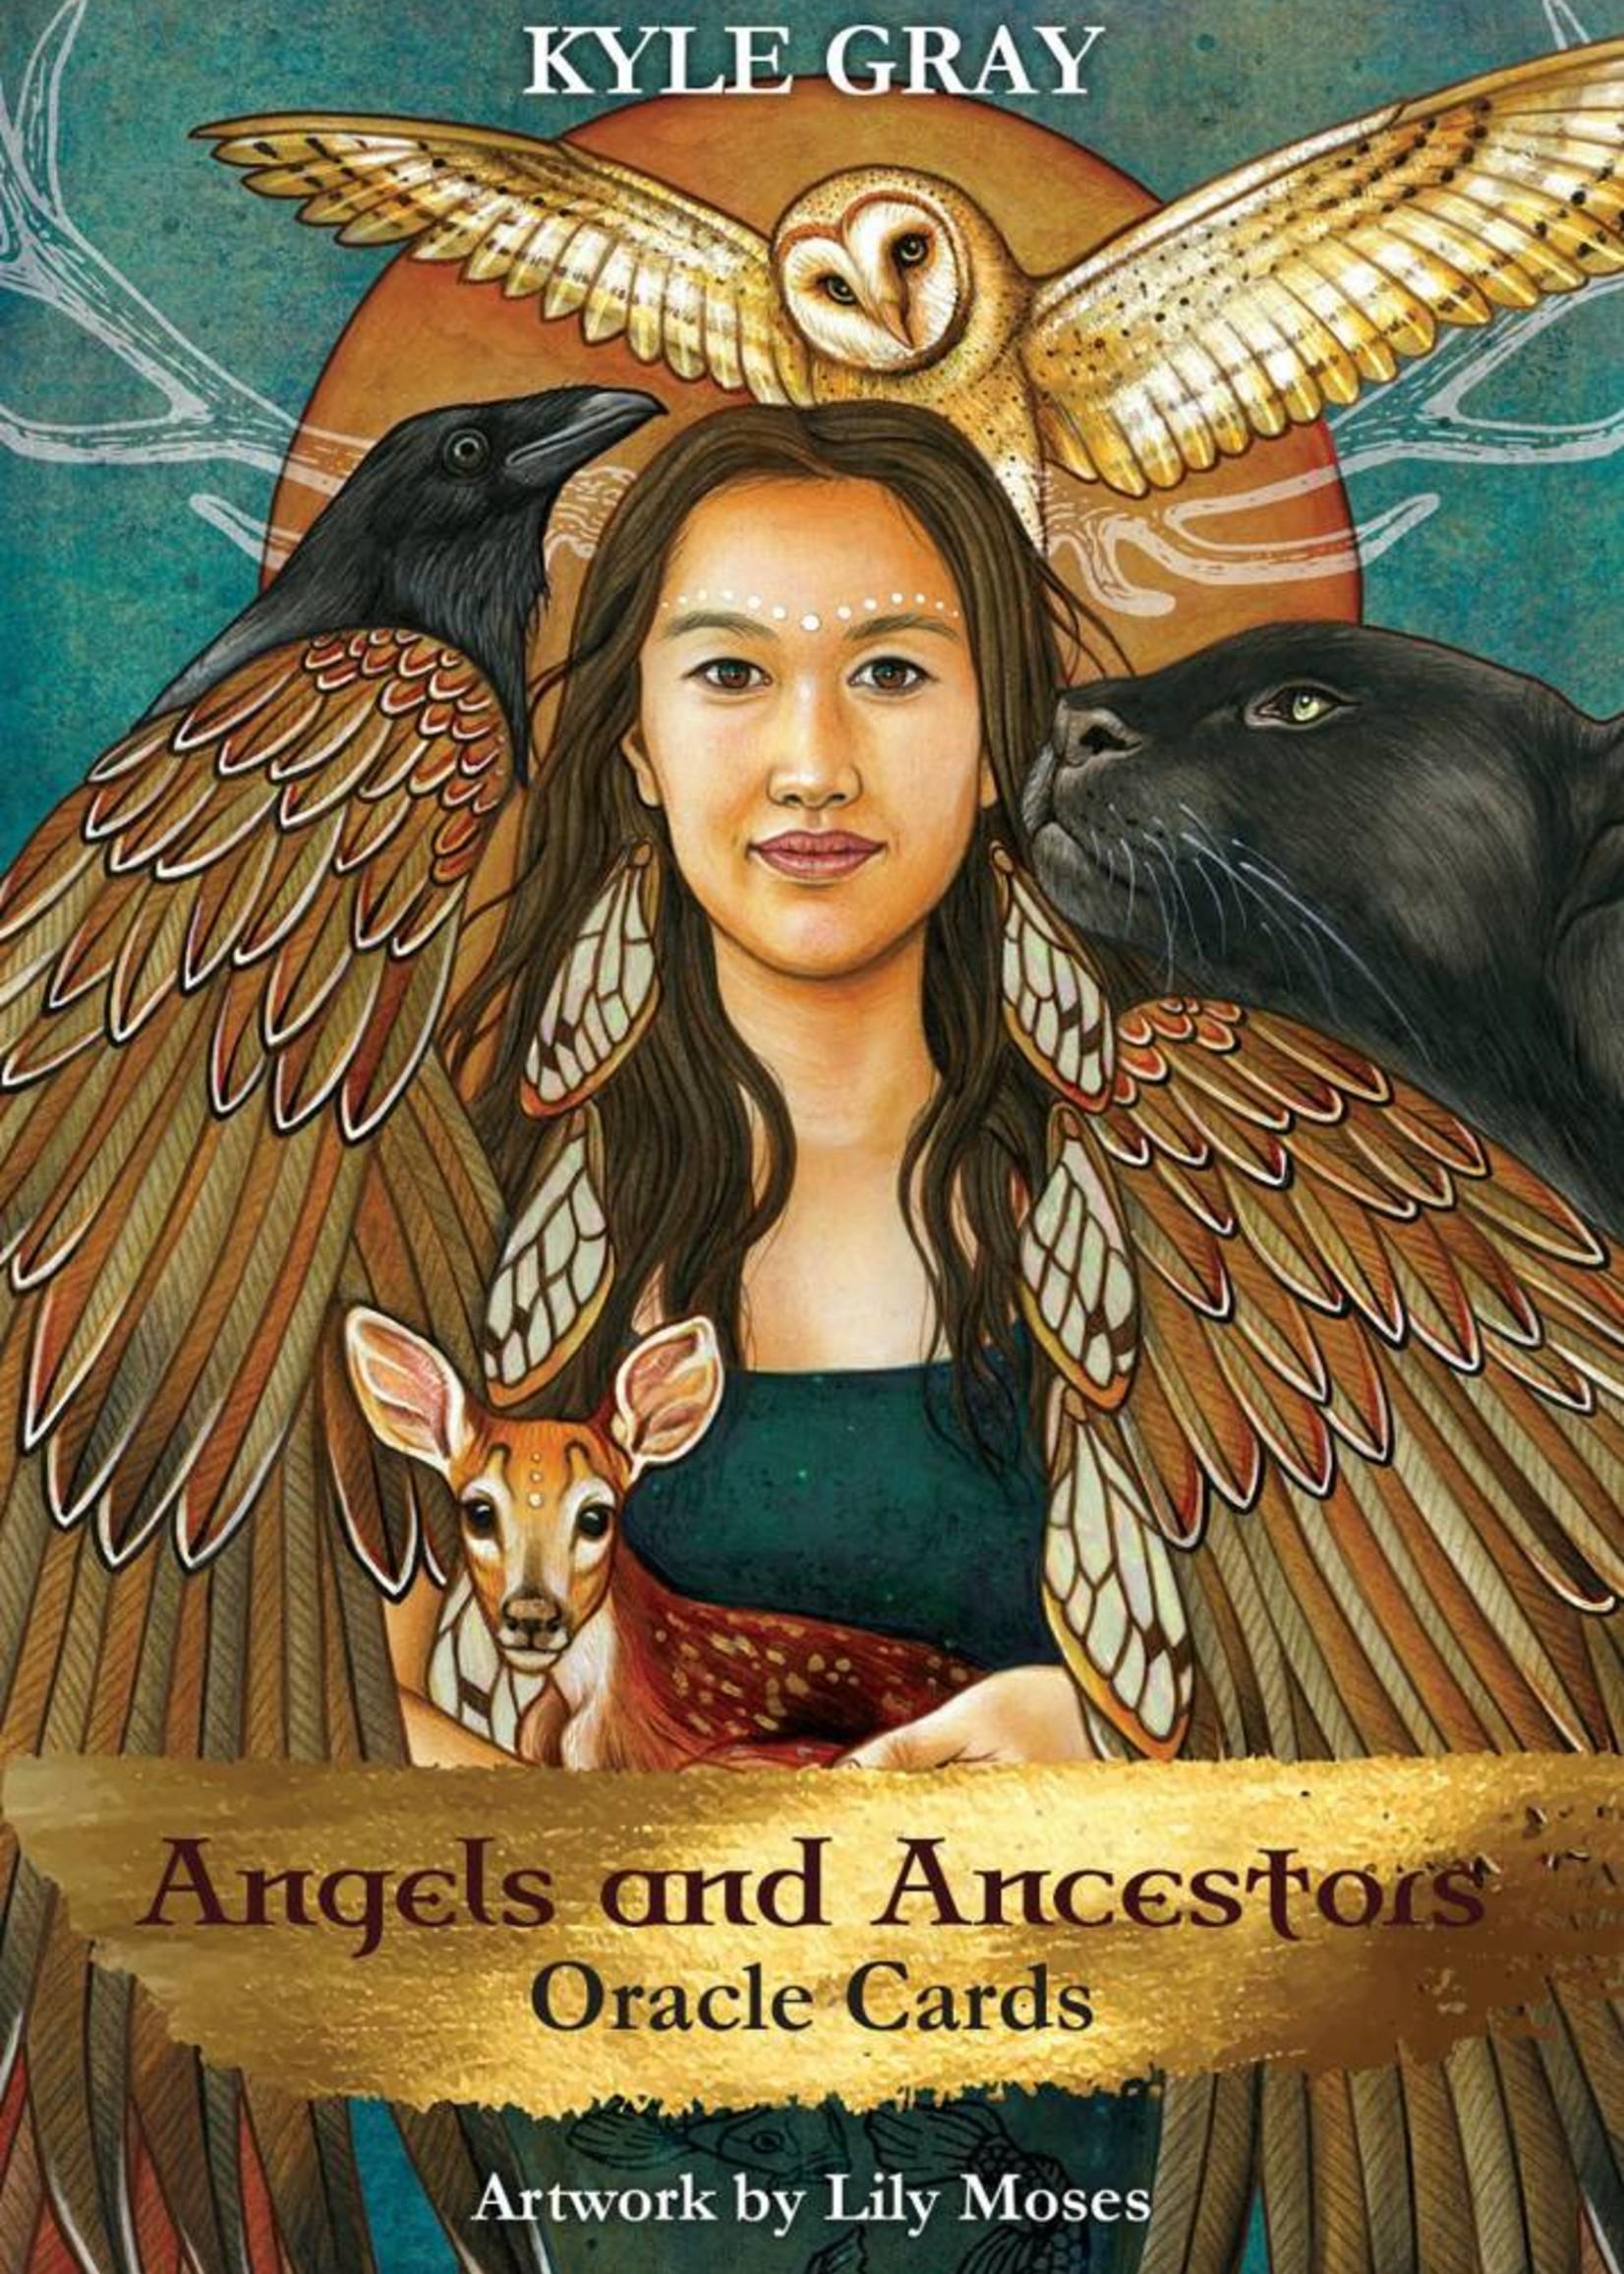 Angels and Ancestors Oracle Deck and Guidebook